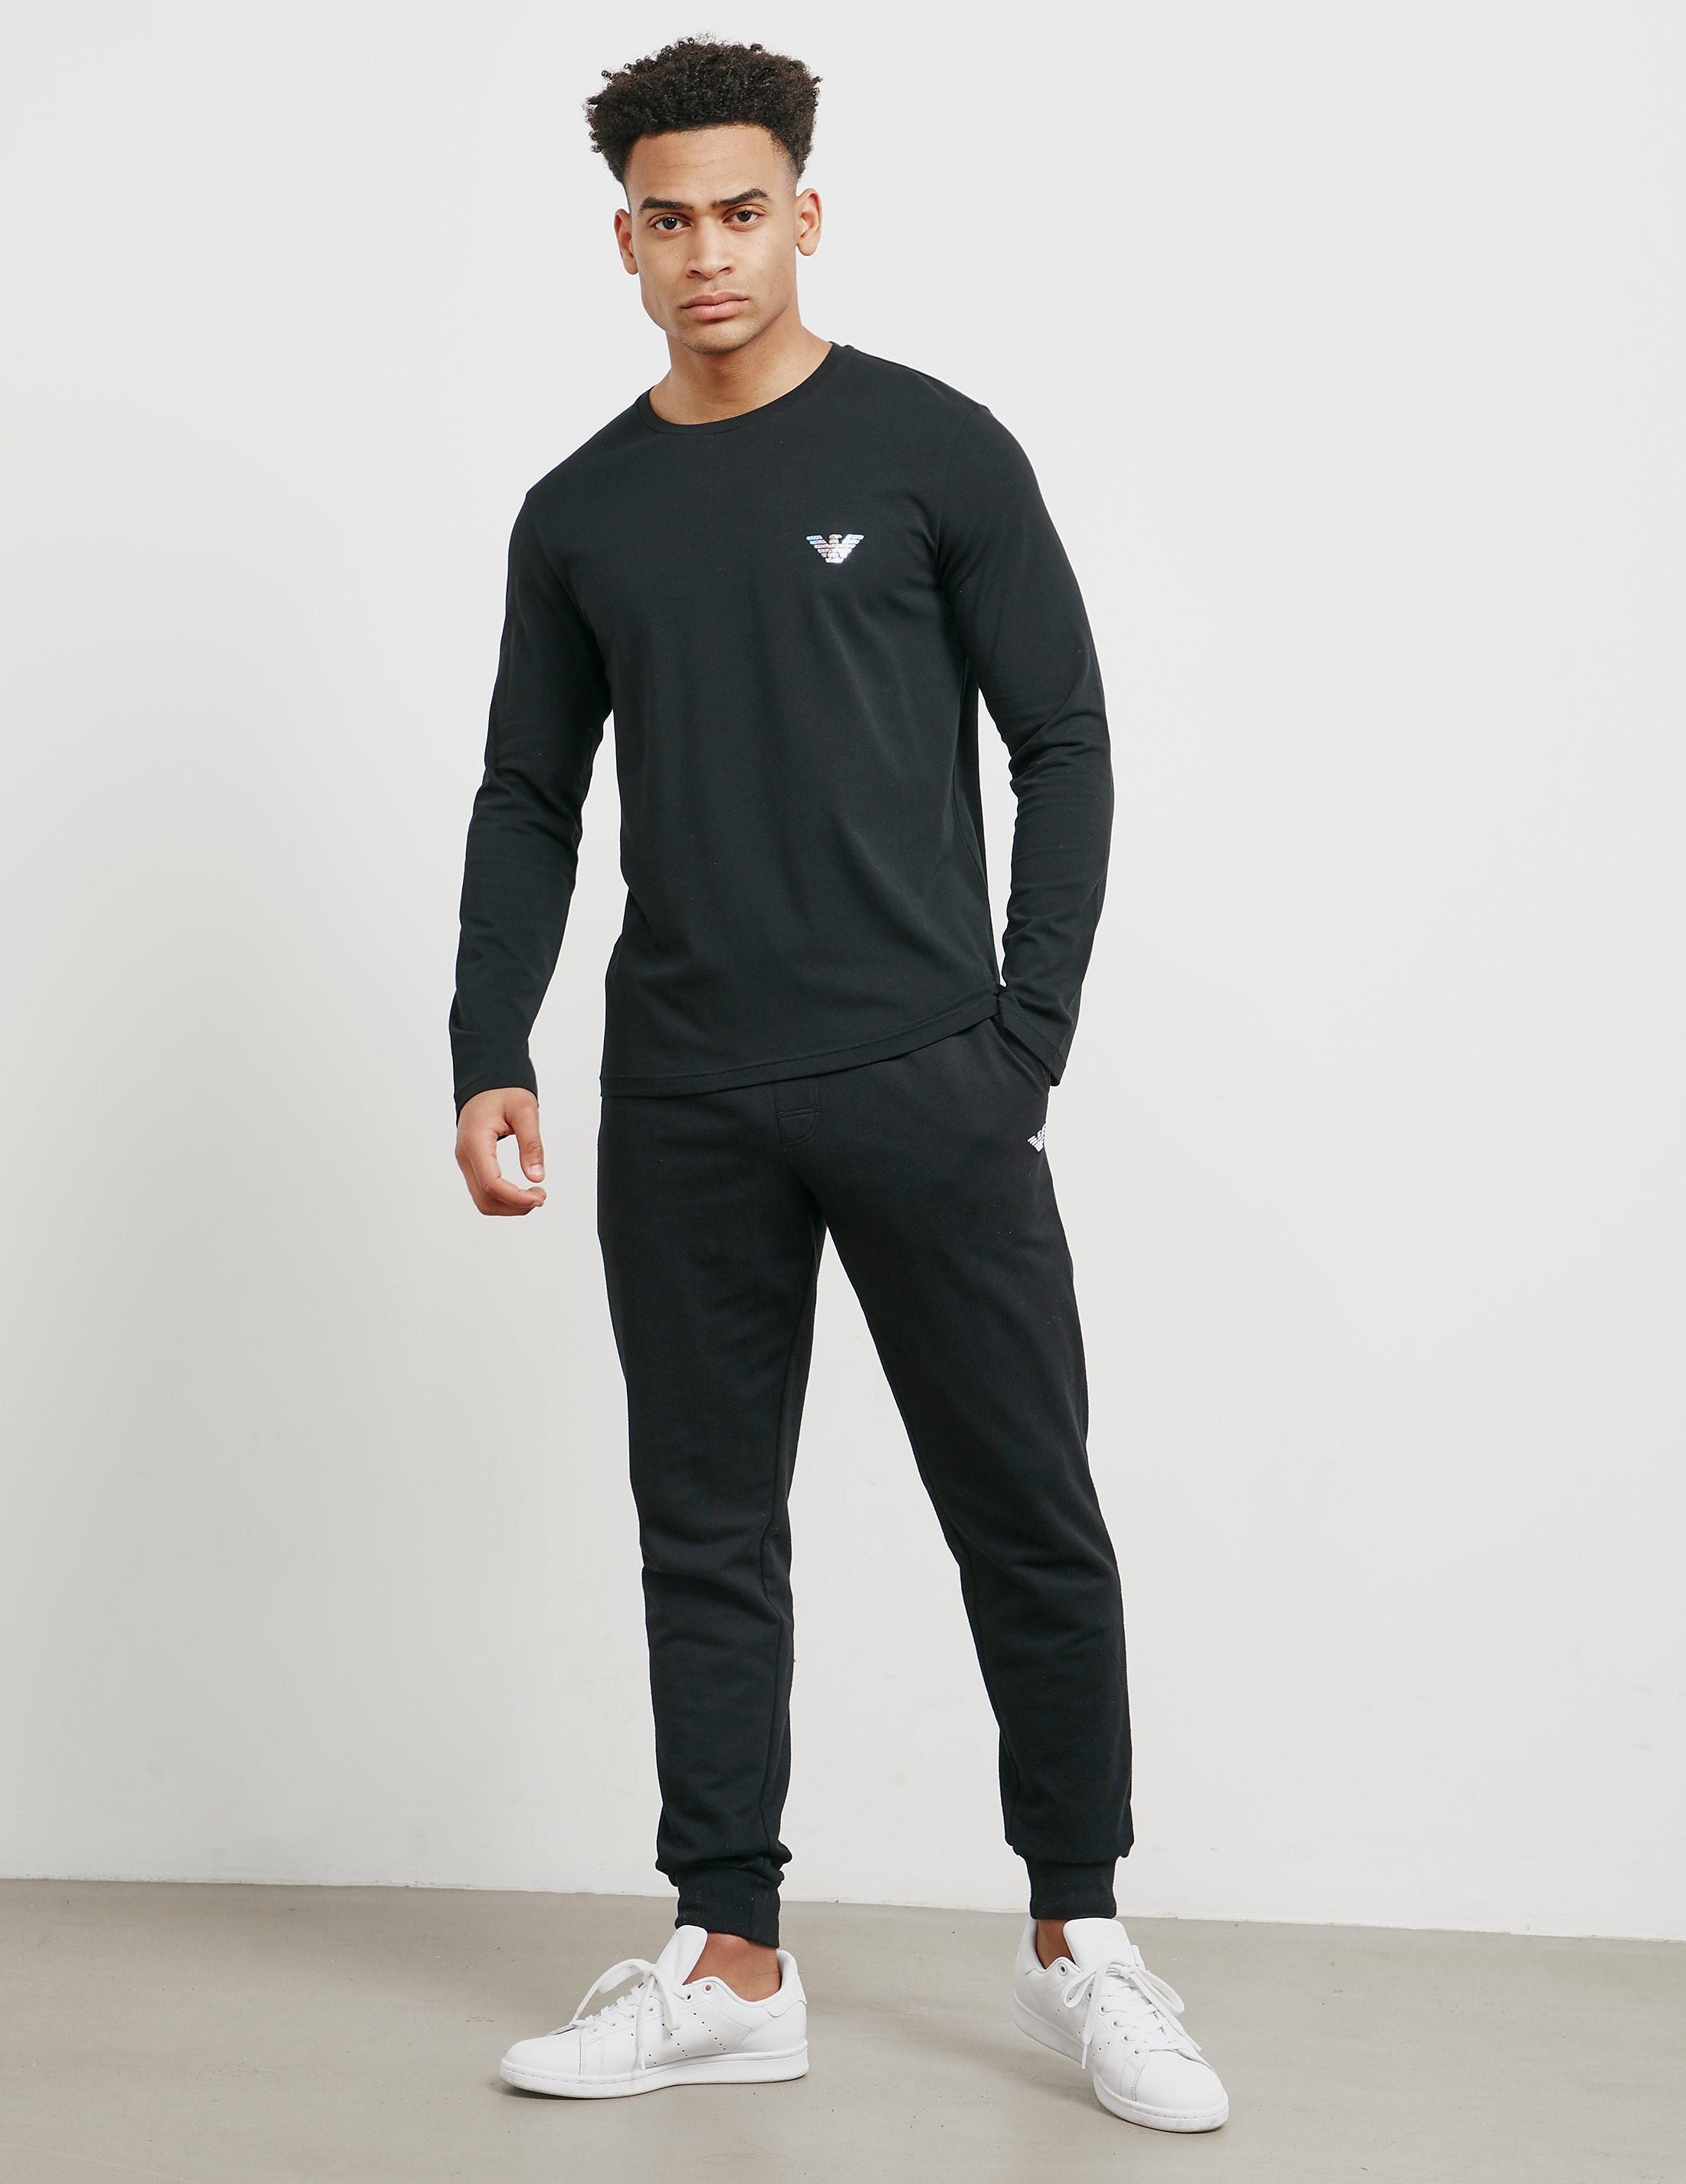 Emporio Armani Long Sleeve Hologram T-Shirt